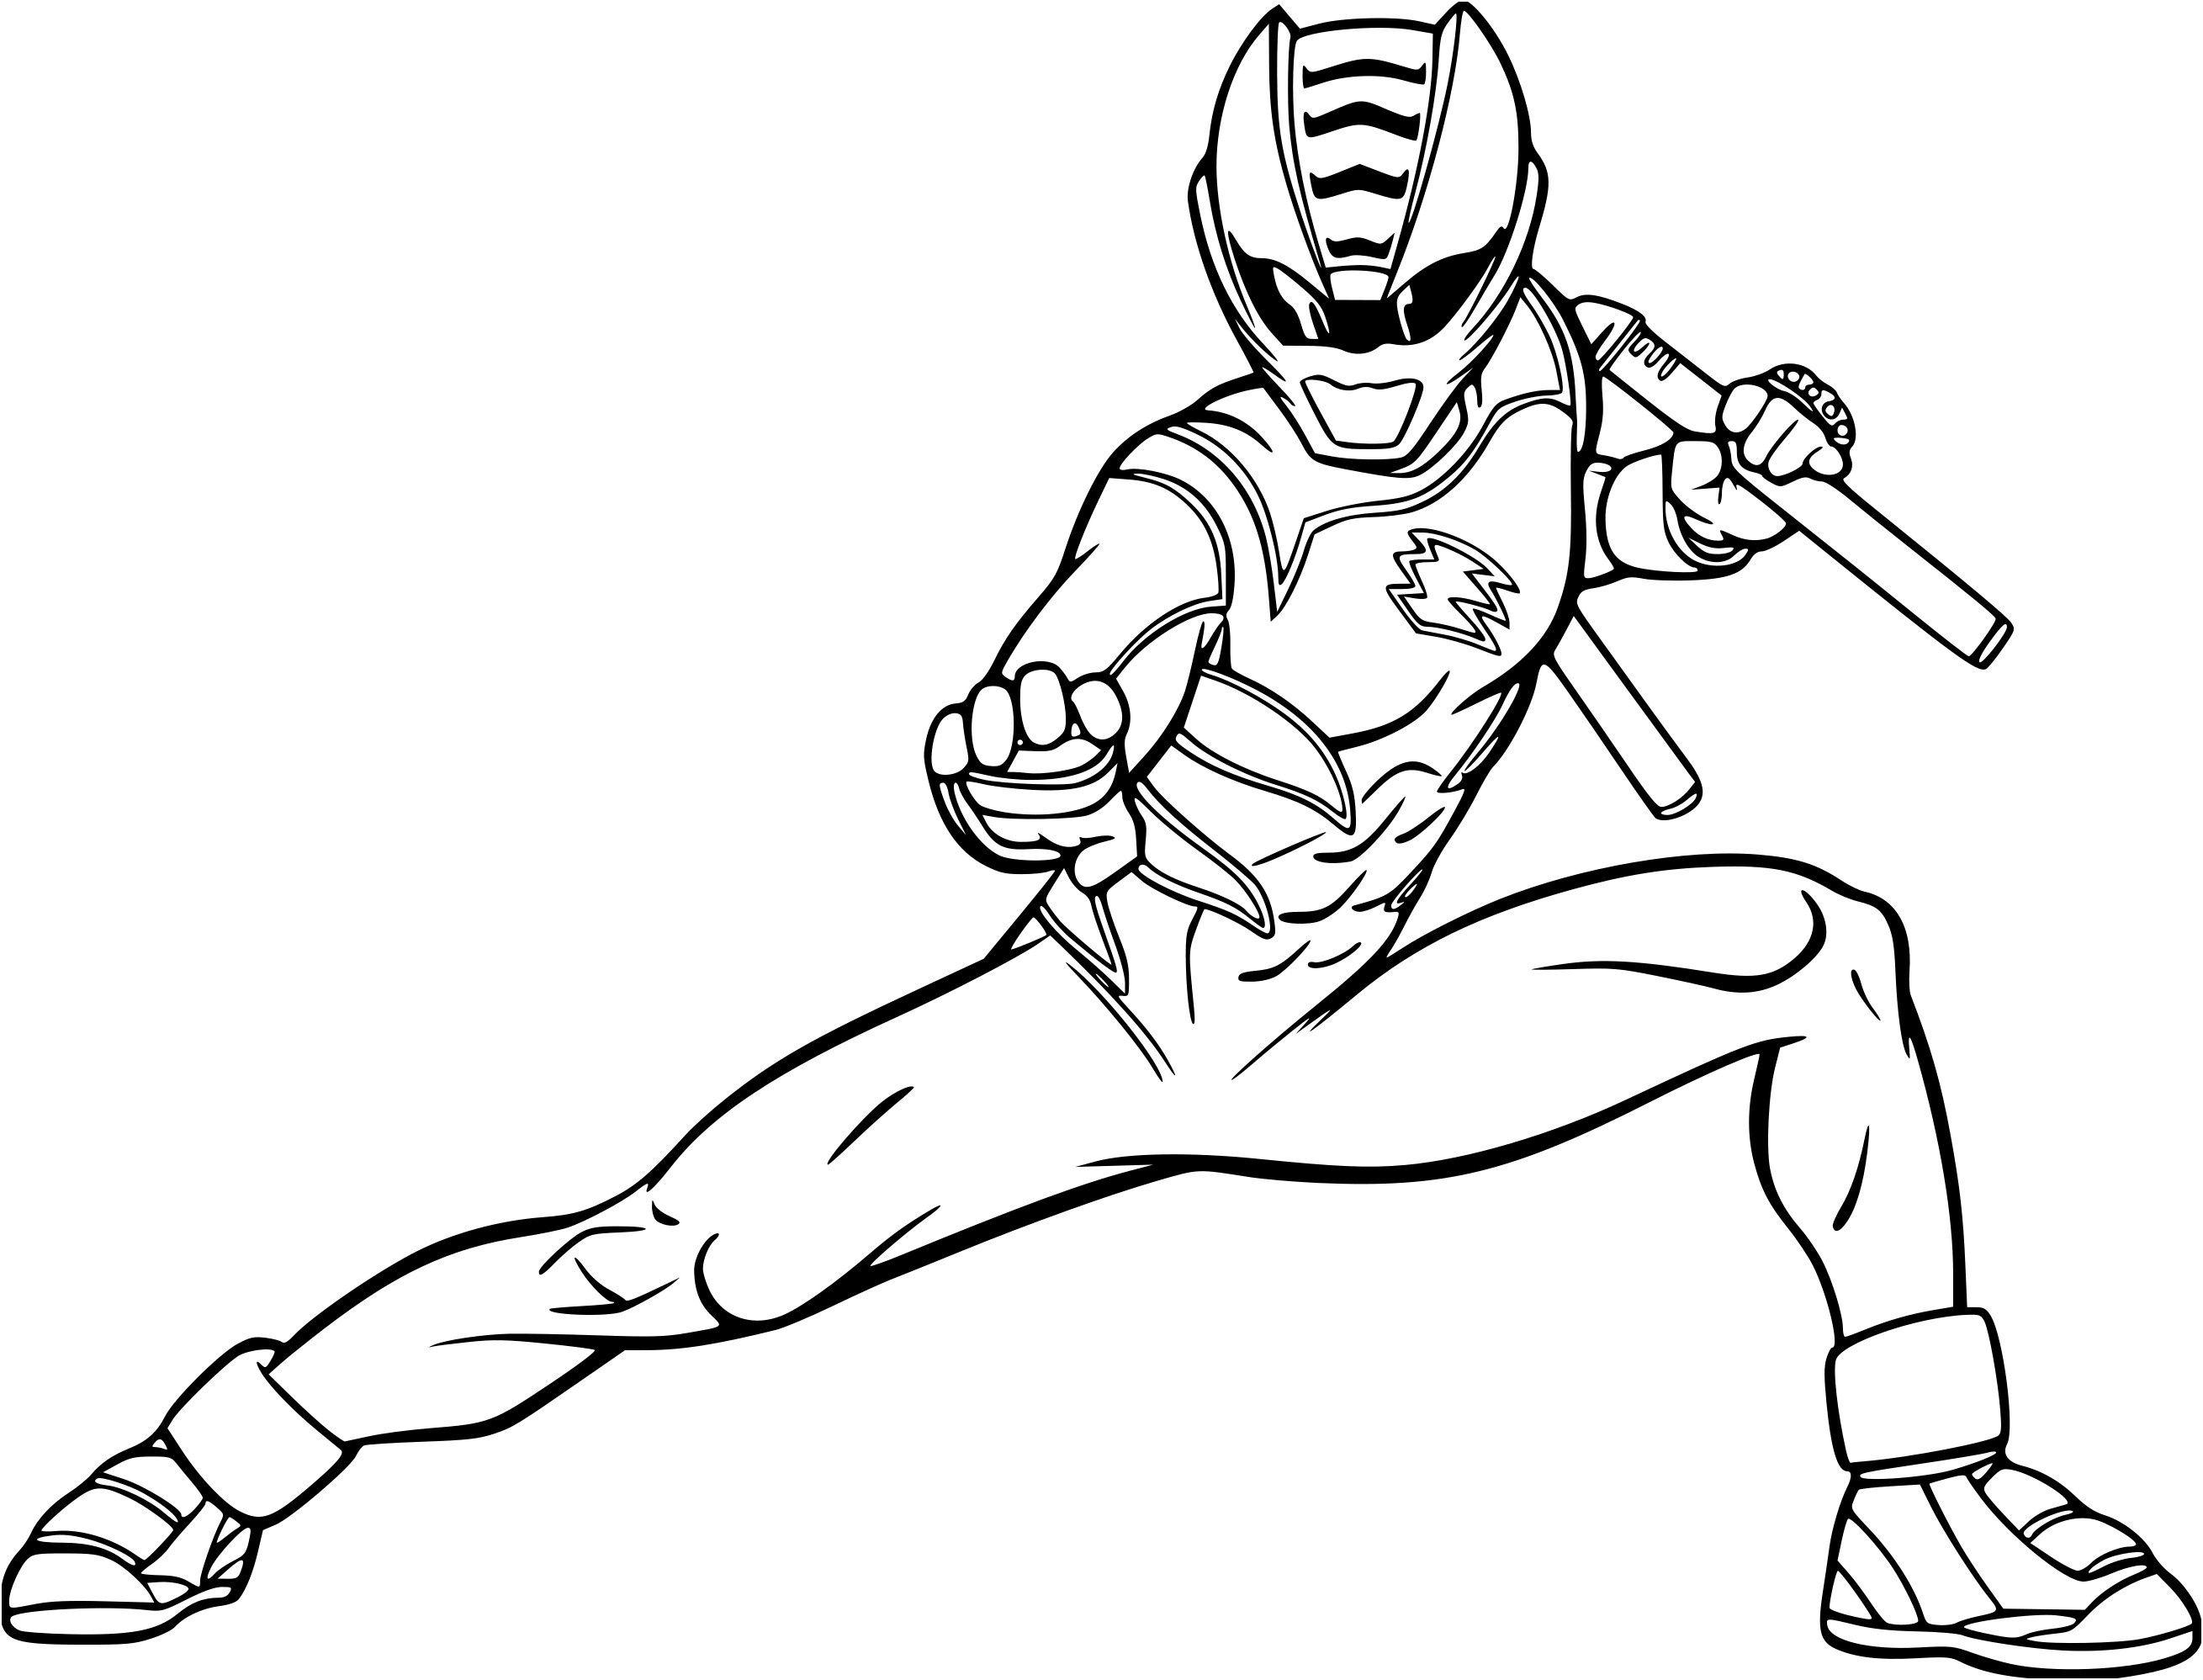 13 Incroyable Coloriage Ninja Steel Pictures